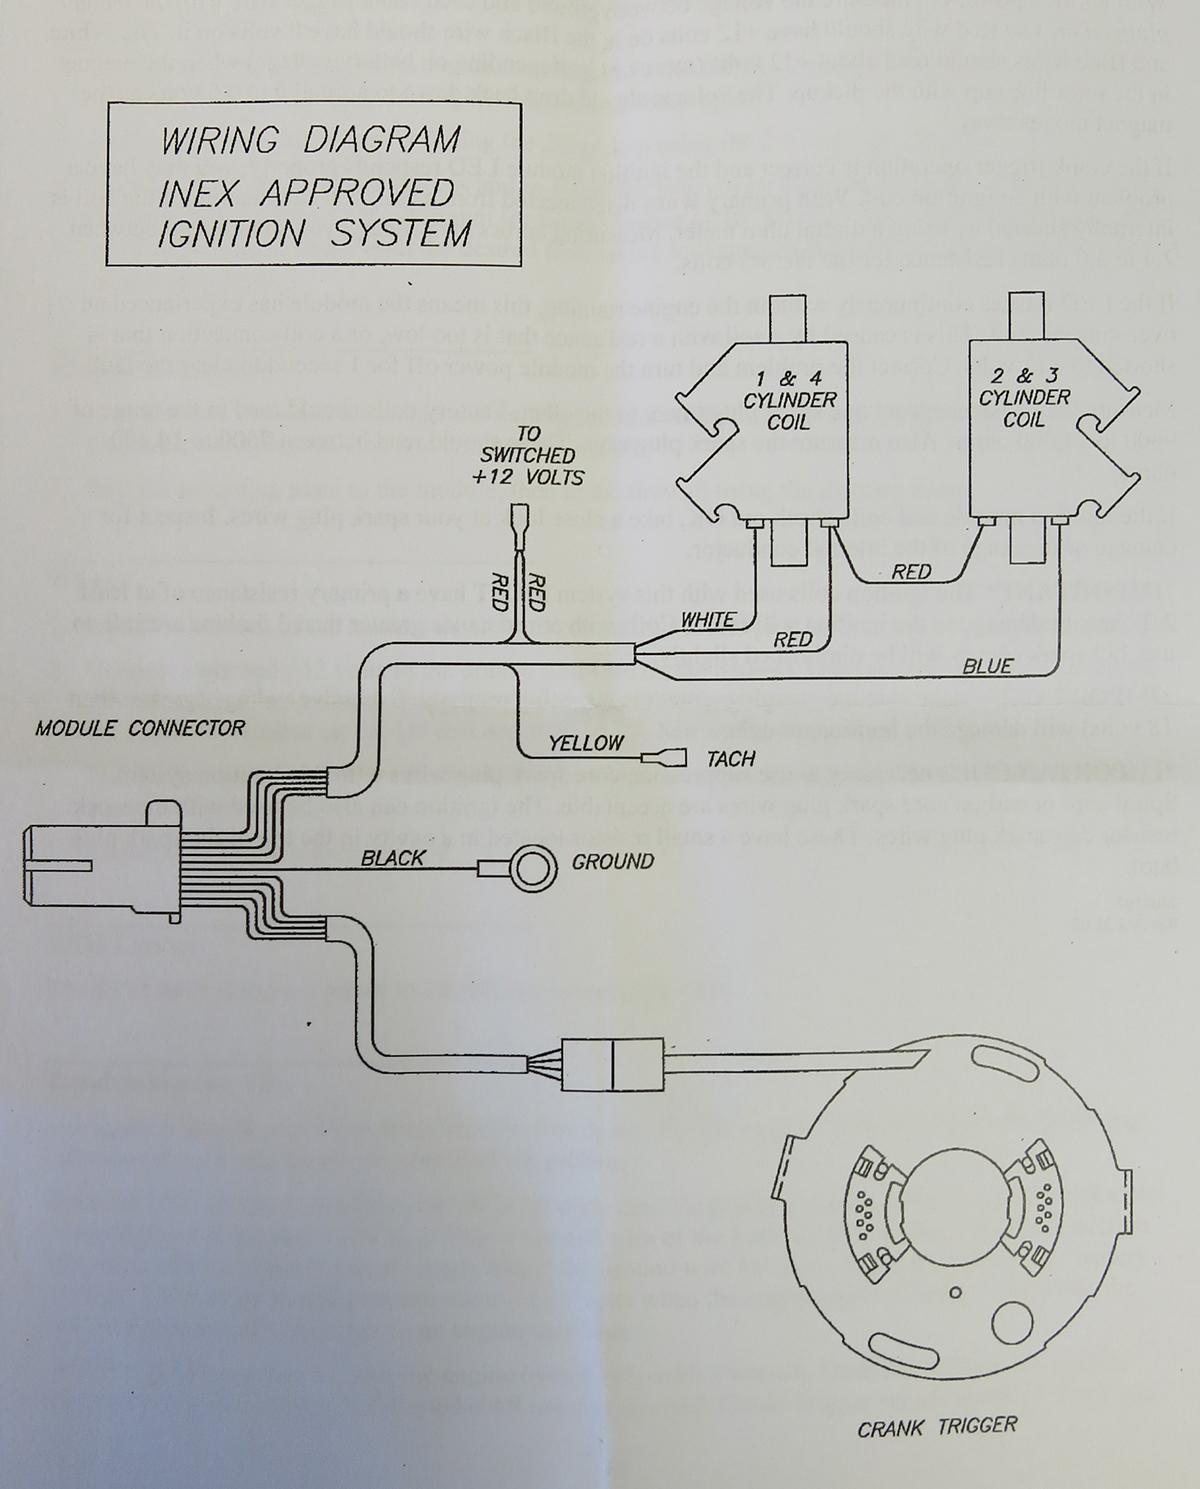 inexboxwiringdiagram?t=1439404195 andrews motorsports technical information fj1200 wiring diagram at gsmportal.co